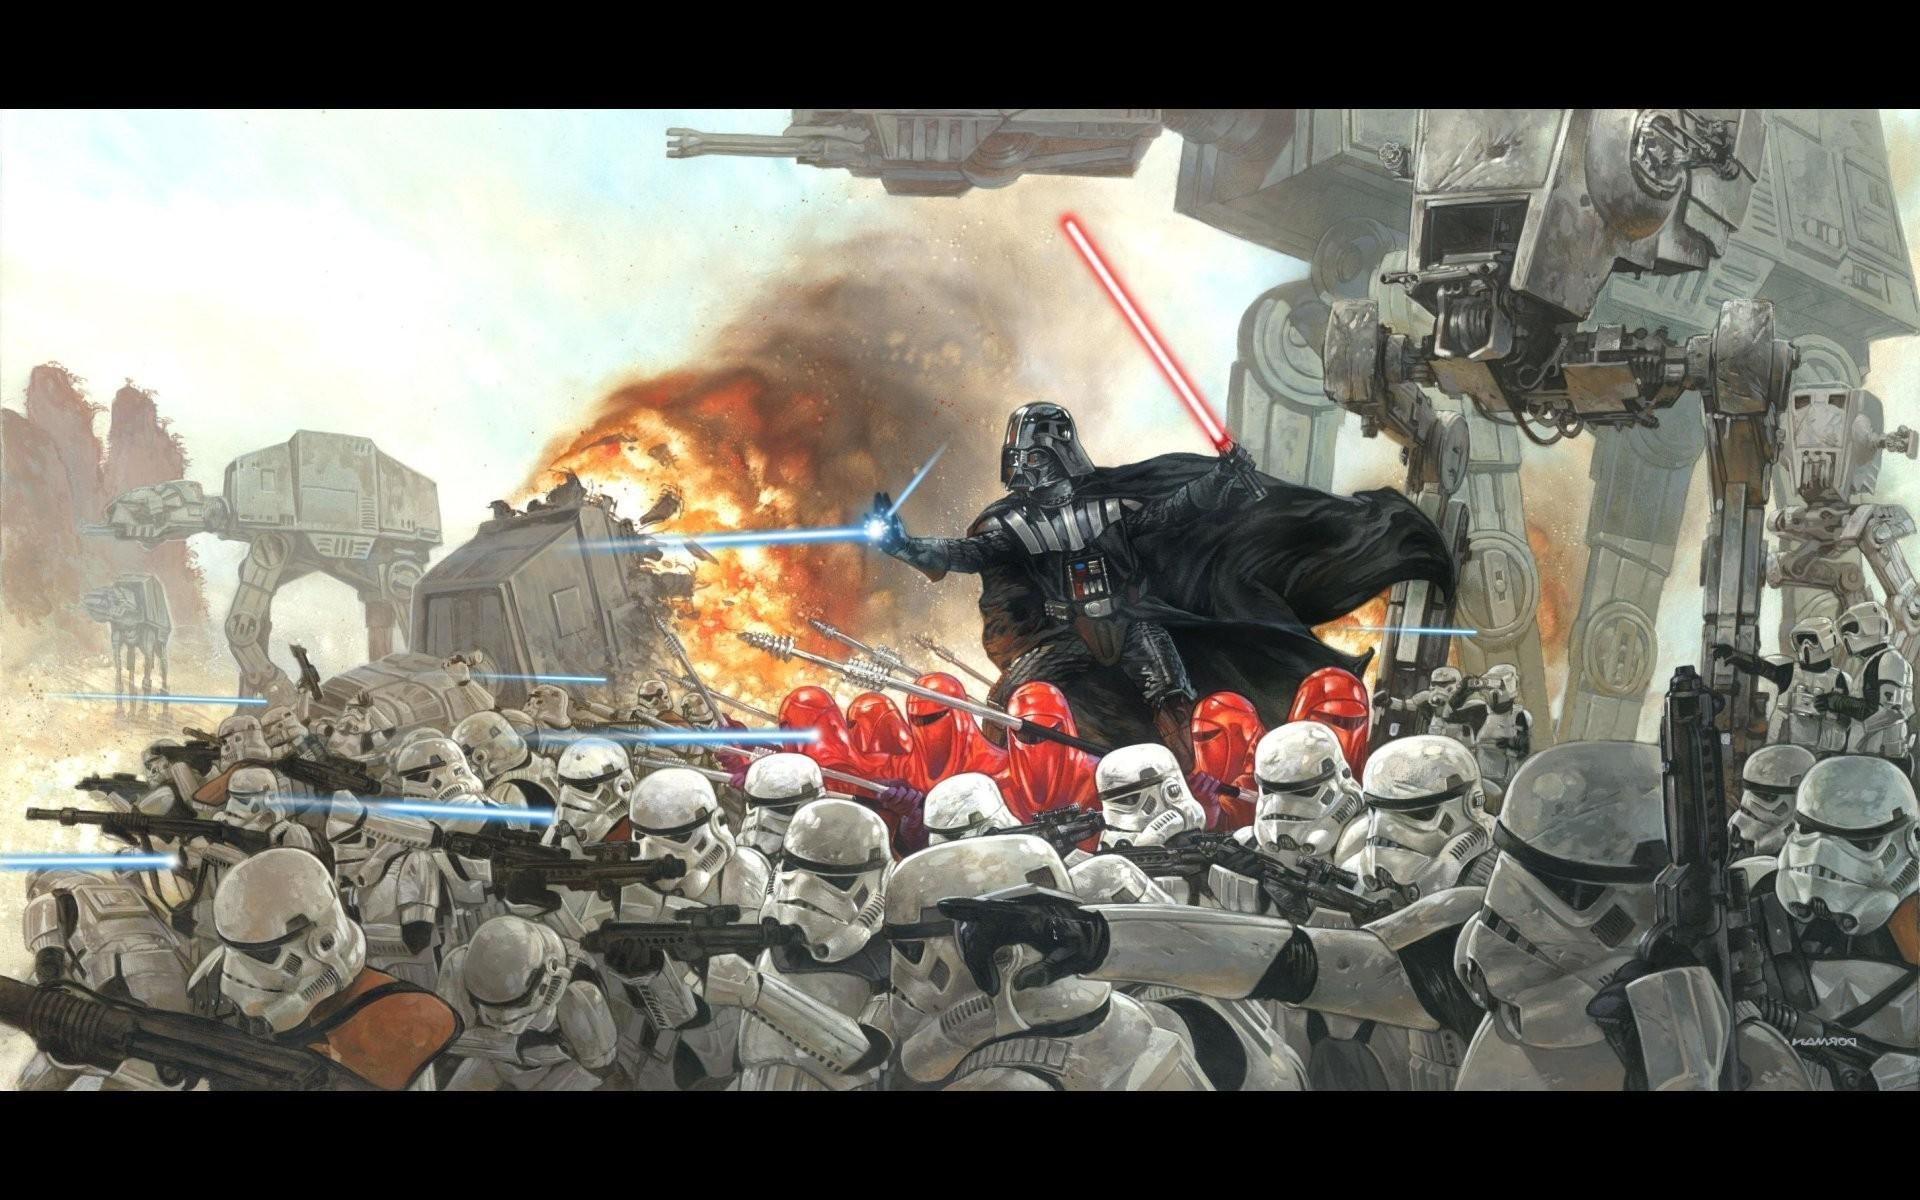 Star Wars battle wallpaper 5898 1920x1200